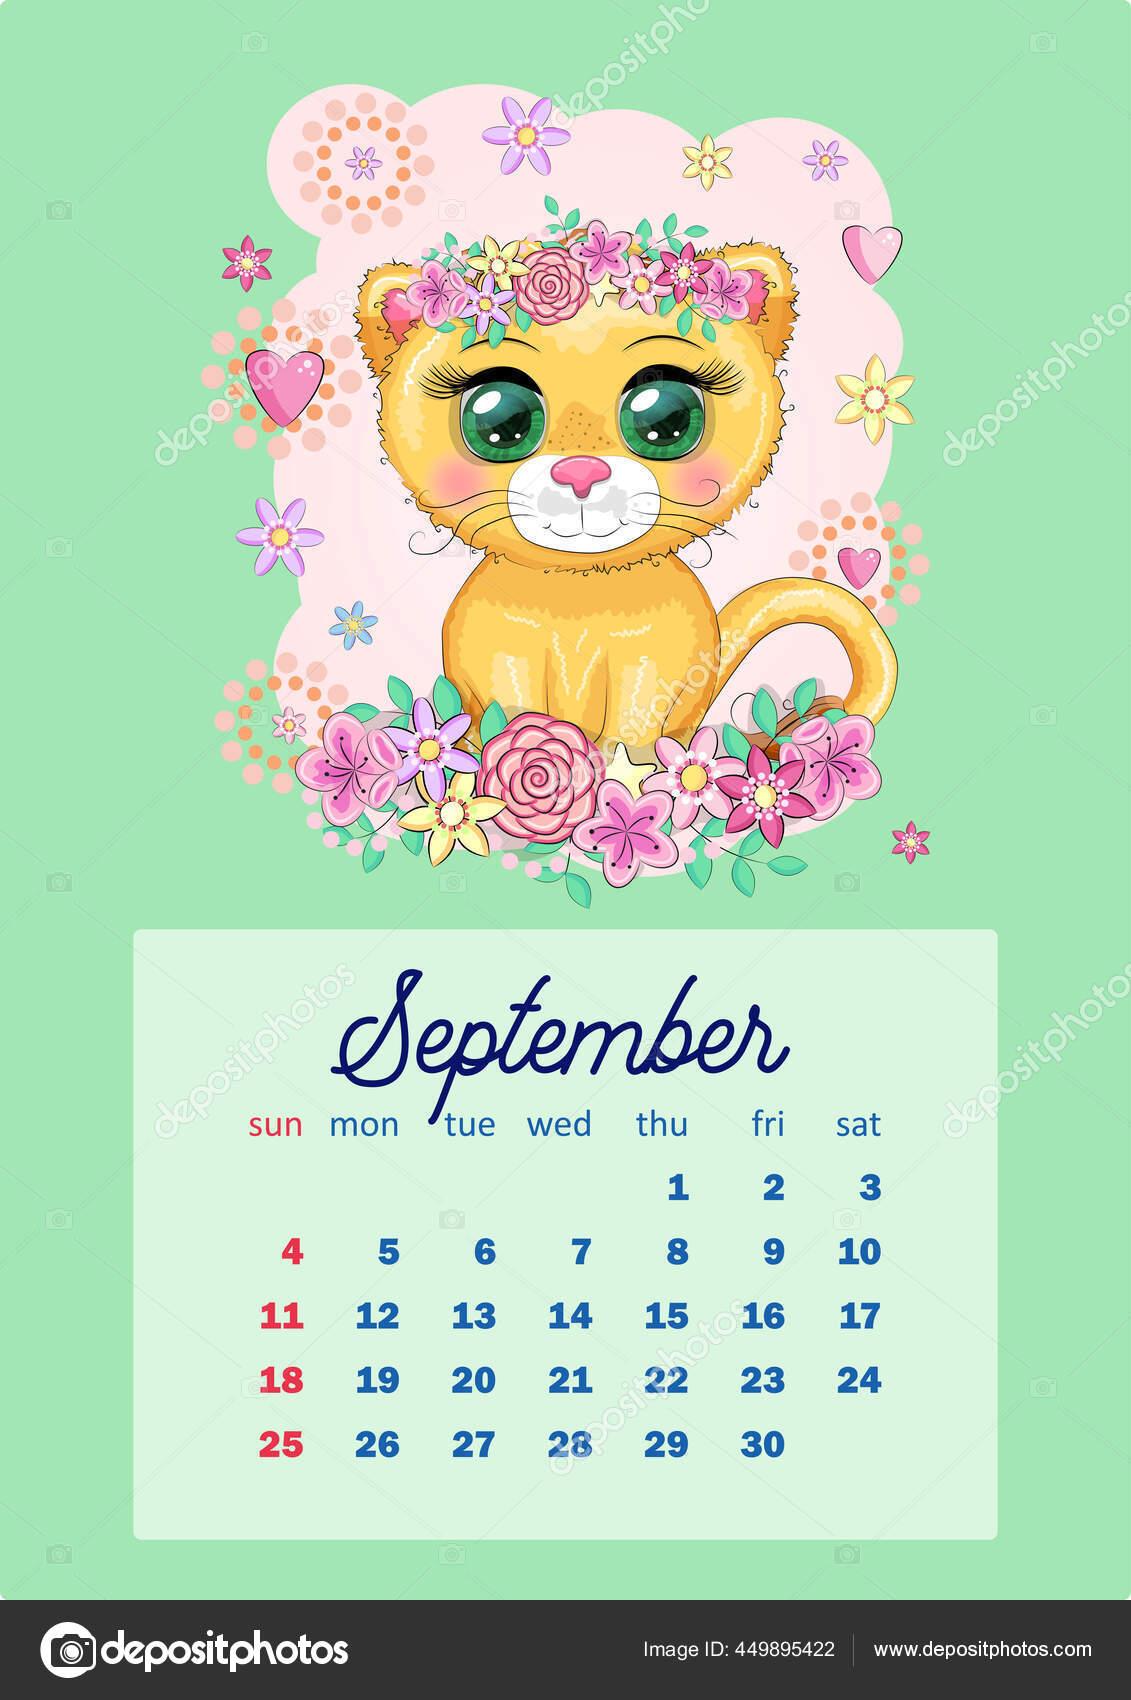 Depo Calendar 2022 Printable.Calendar 2022 Cute Cardboard Animals Every Month Tiger Snow Leopard Vector Image By C Michiru13 Vector Stock 449895422